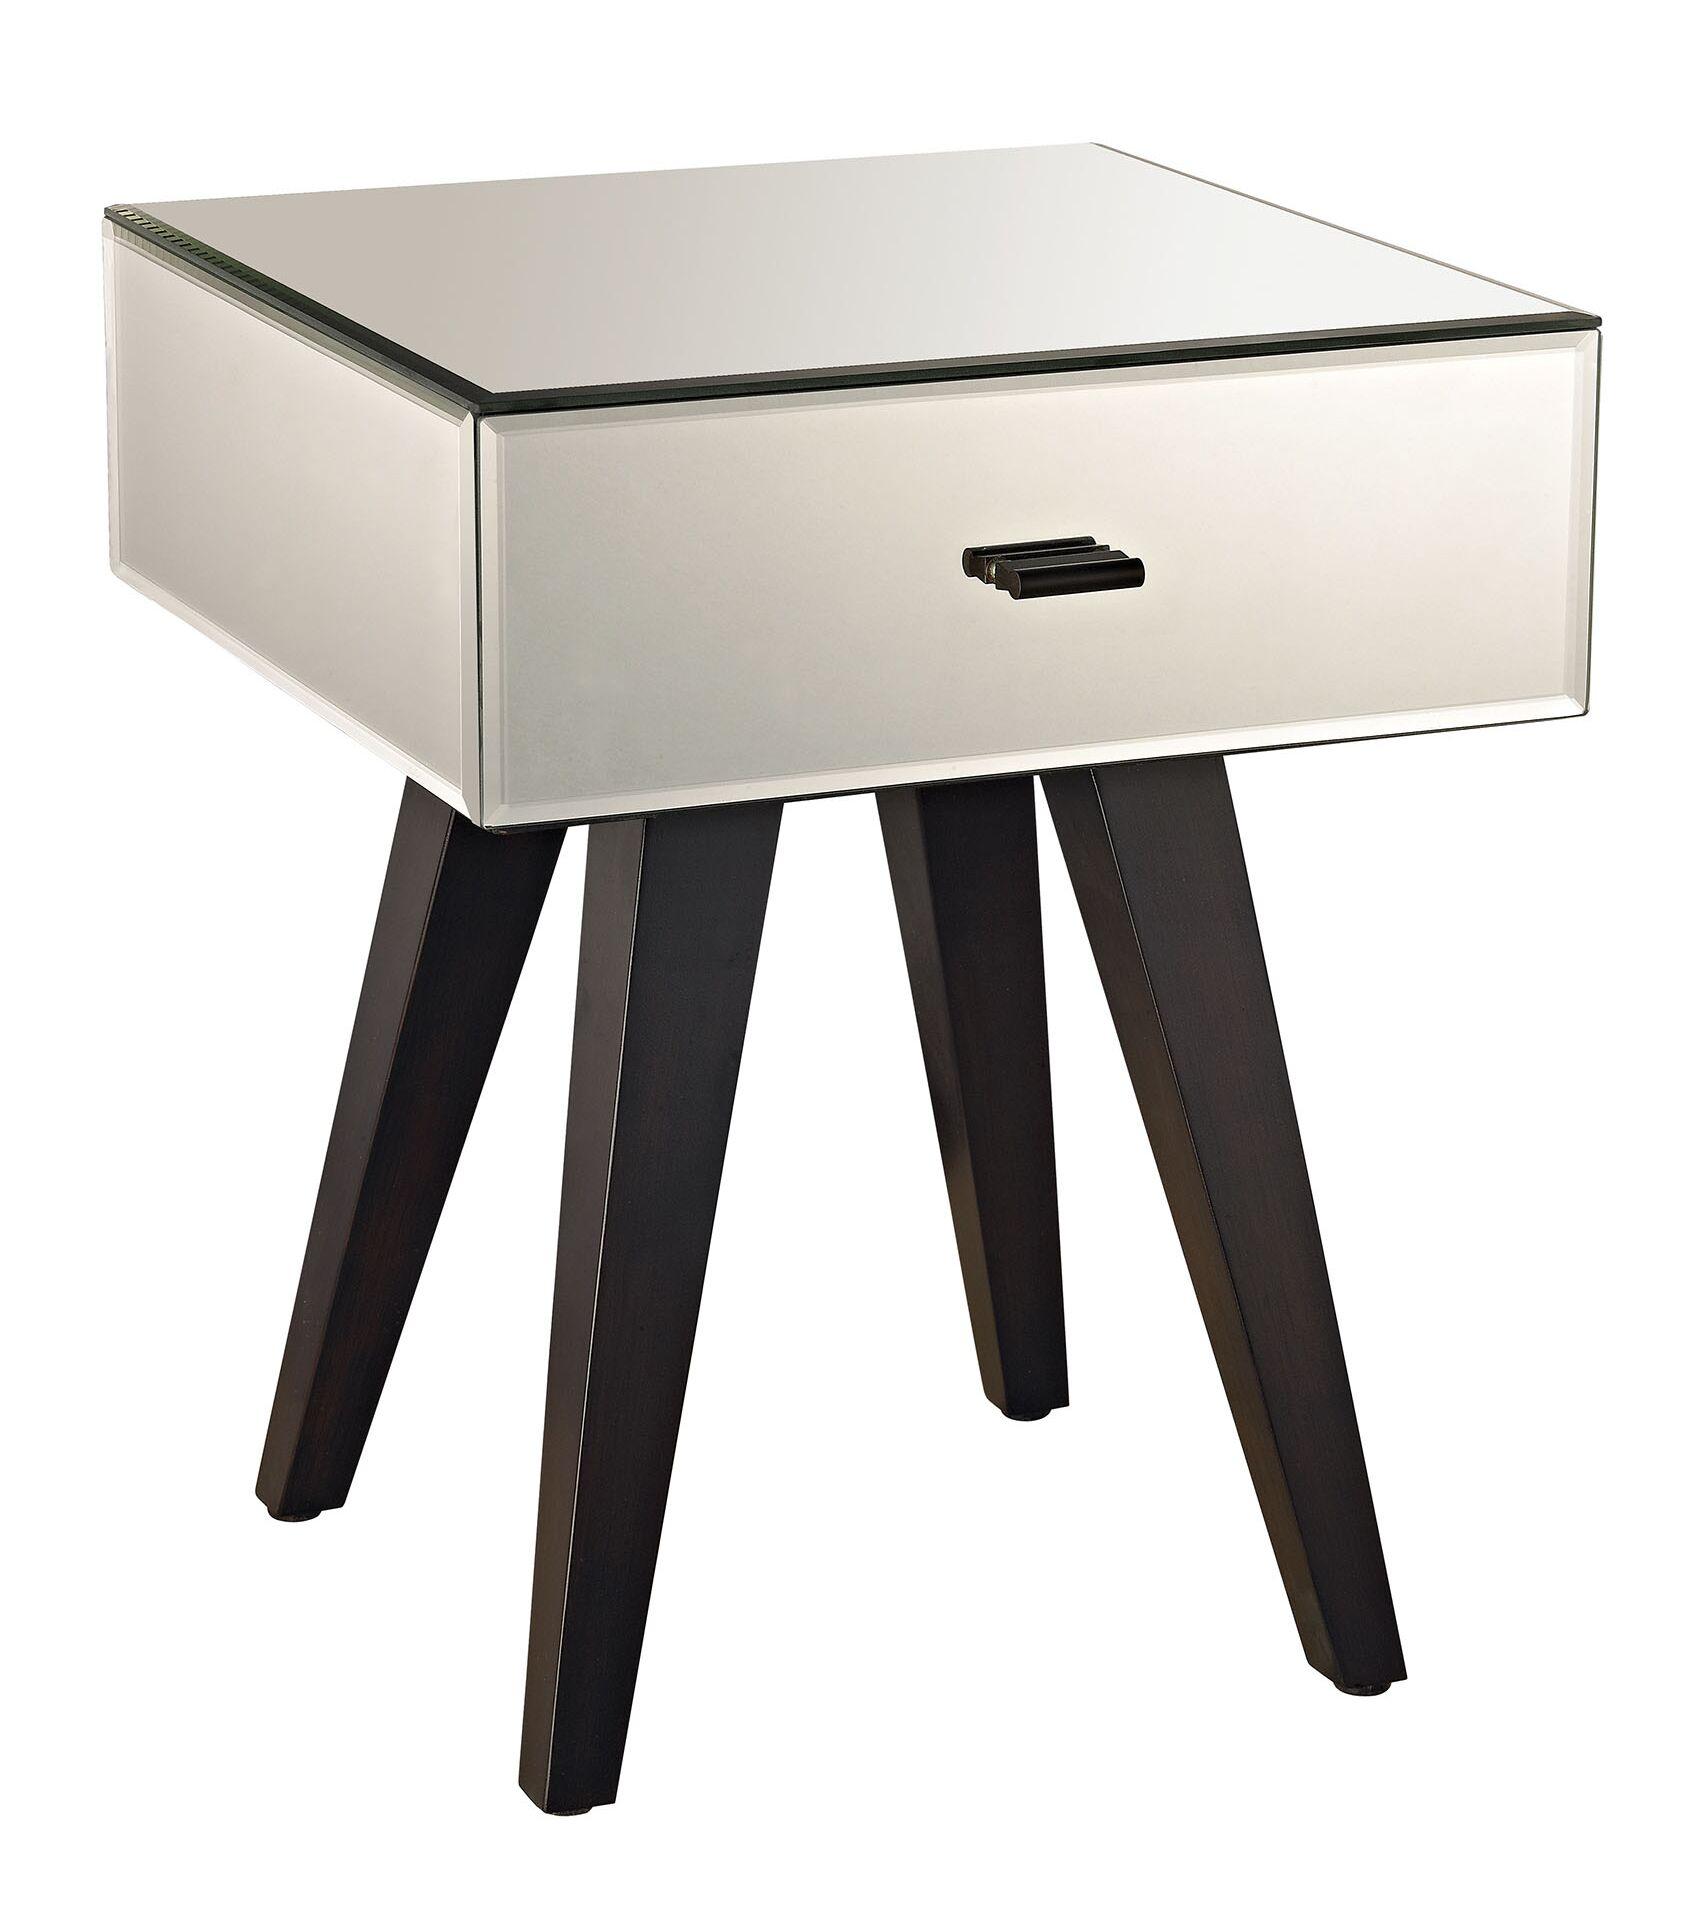 Saniyah 1 Drawer End Table